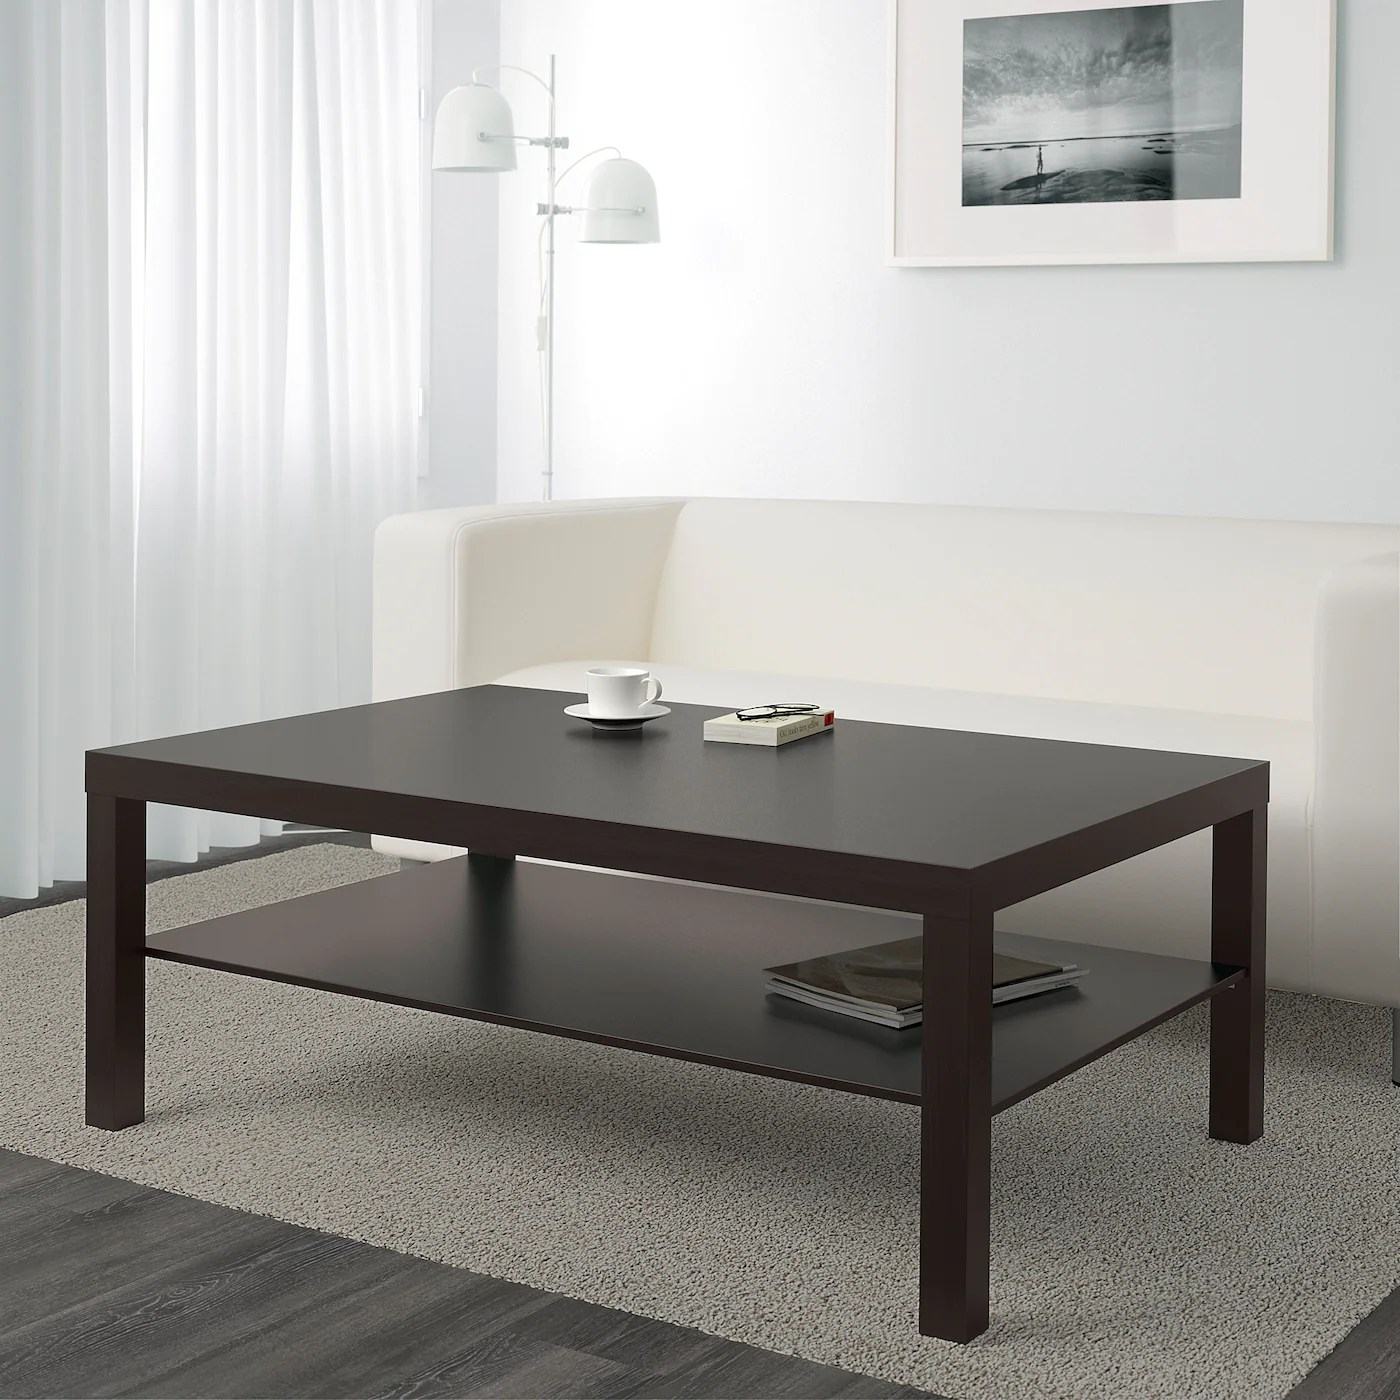 lack coffee table black brown 46 1 2x30 3 4 118x78 cm